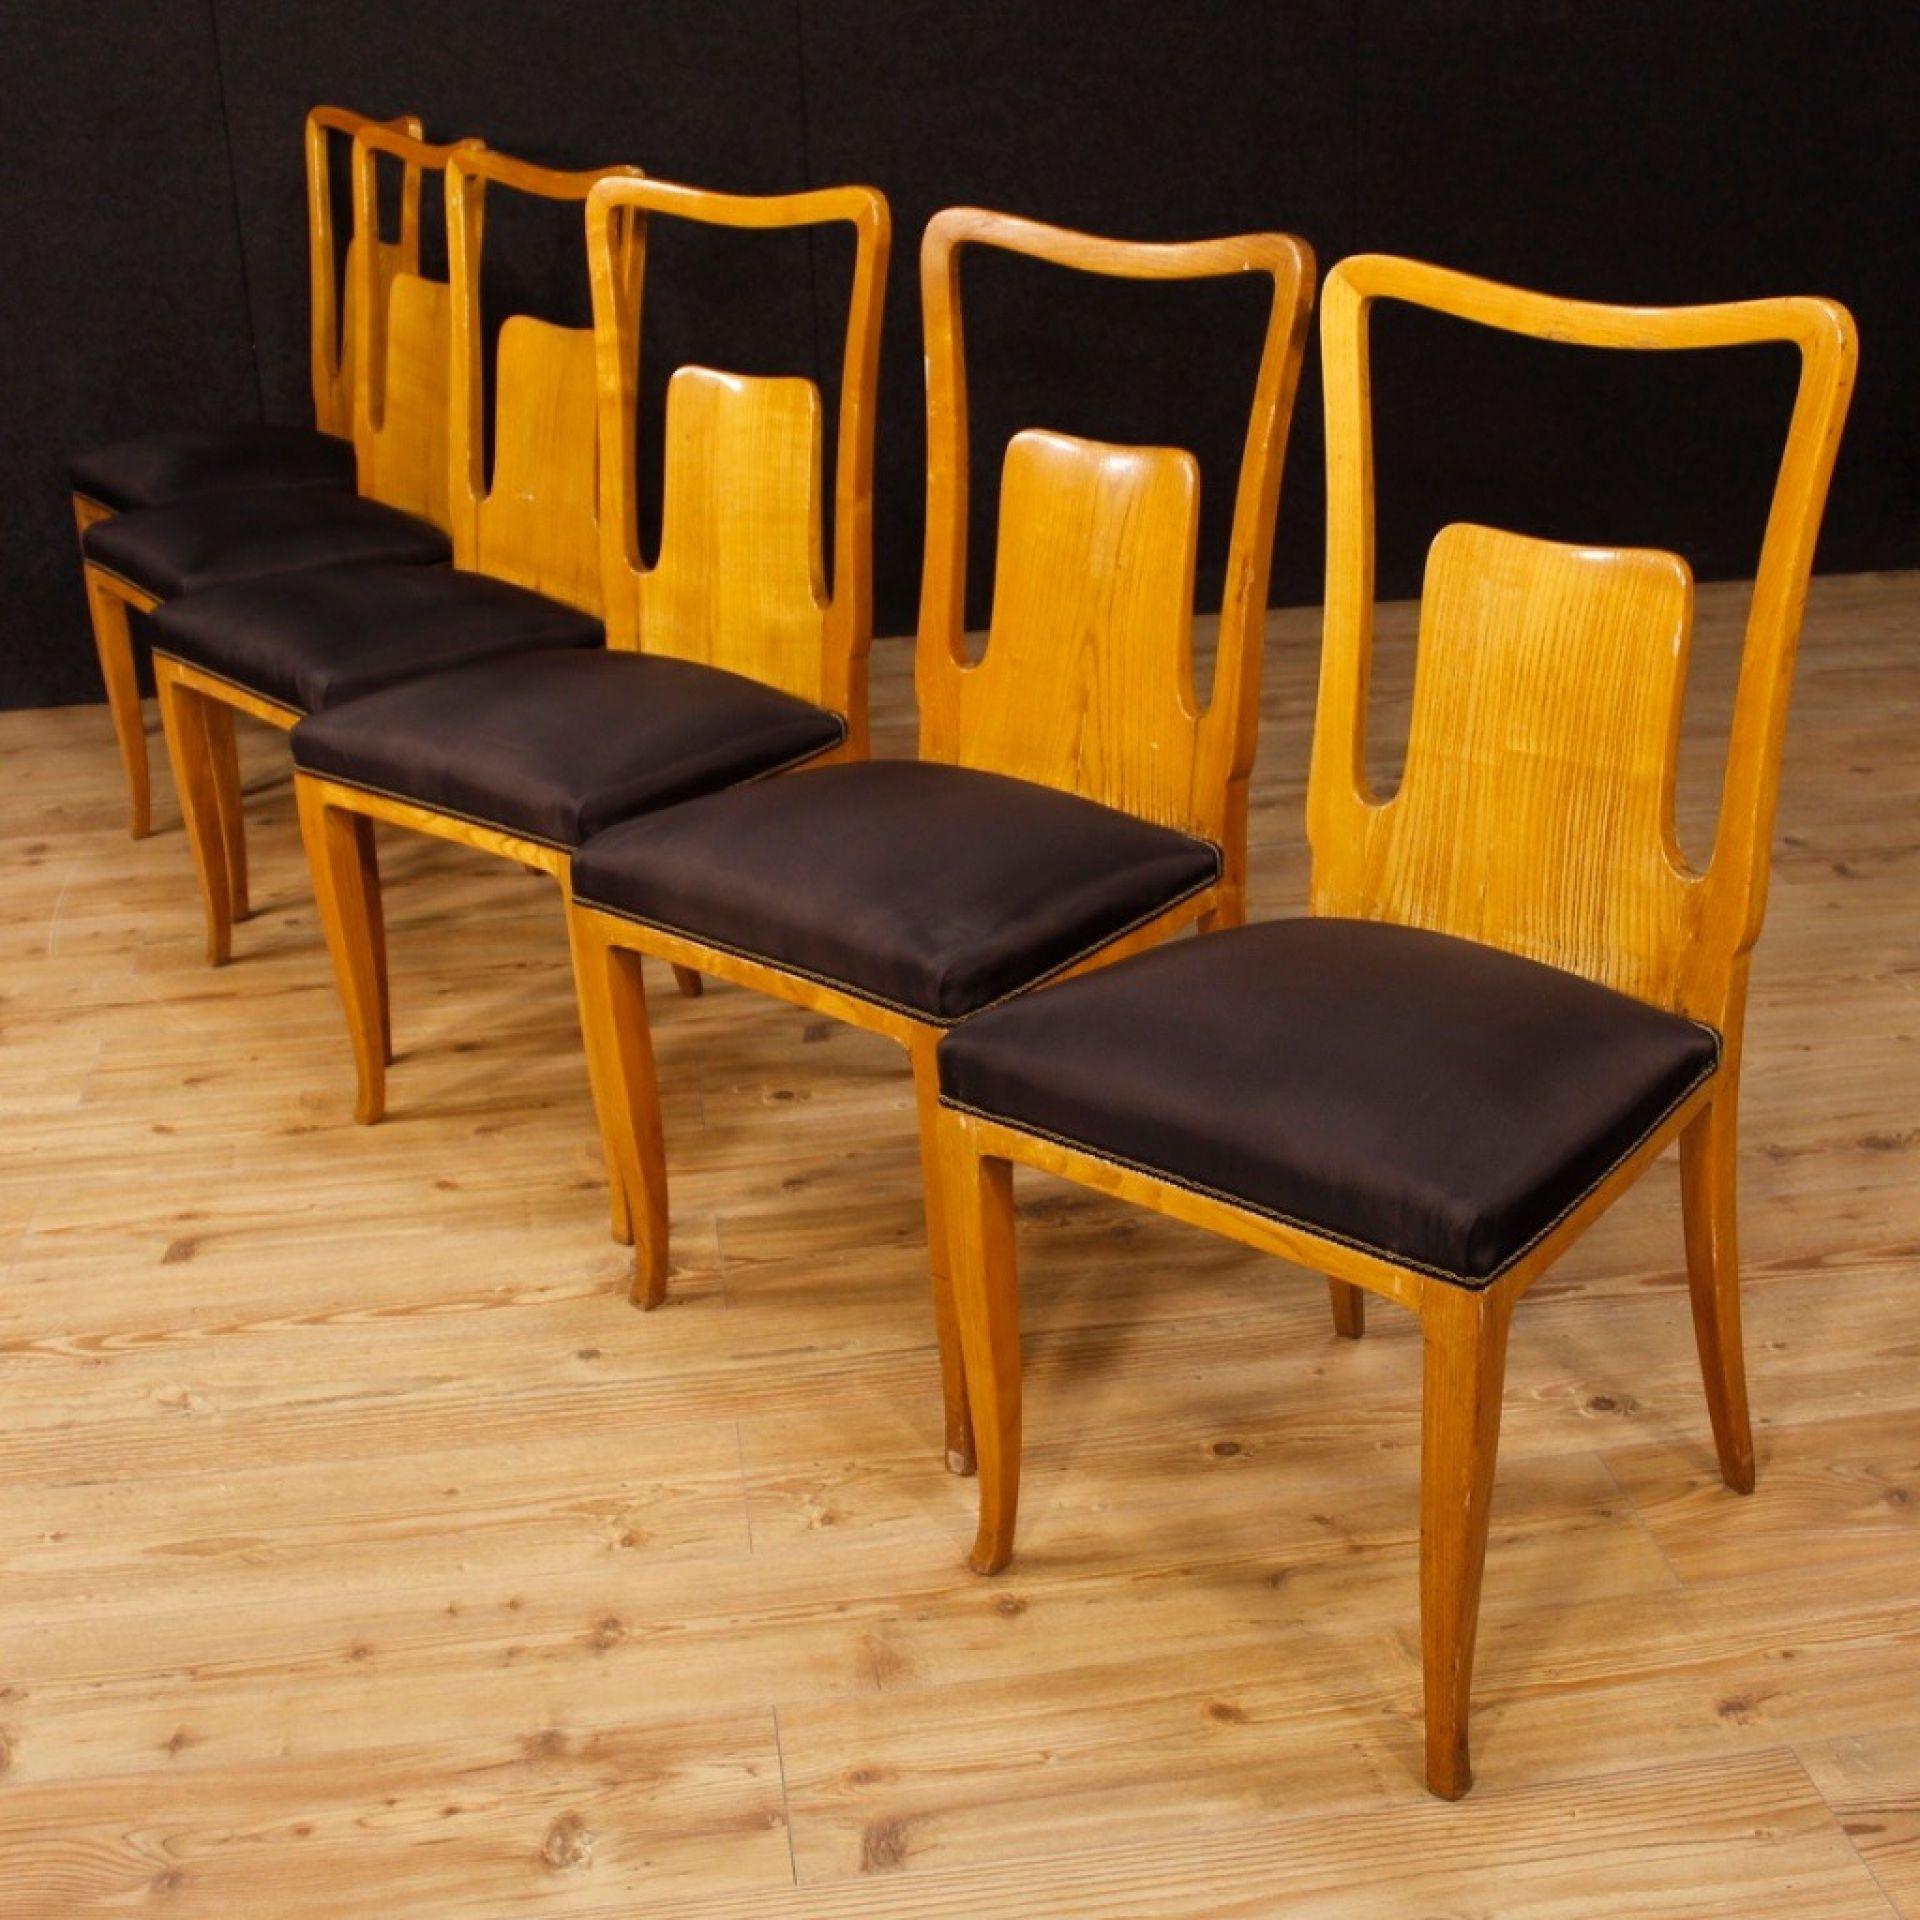 Ico Parisi 20th Century Wood and Fabric Italian Design 6 Chairs, 1950